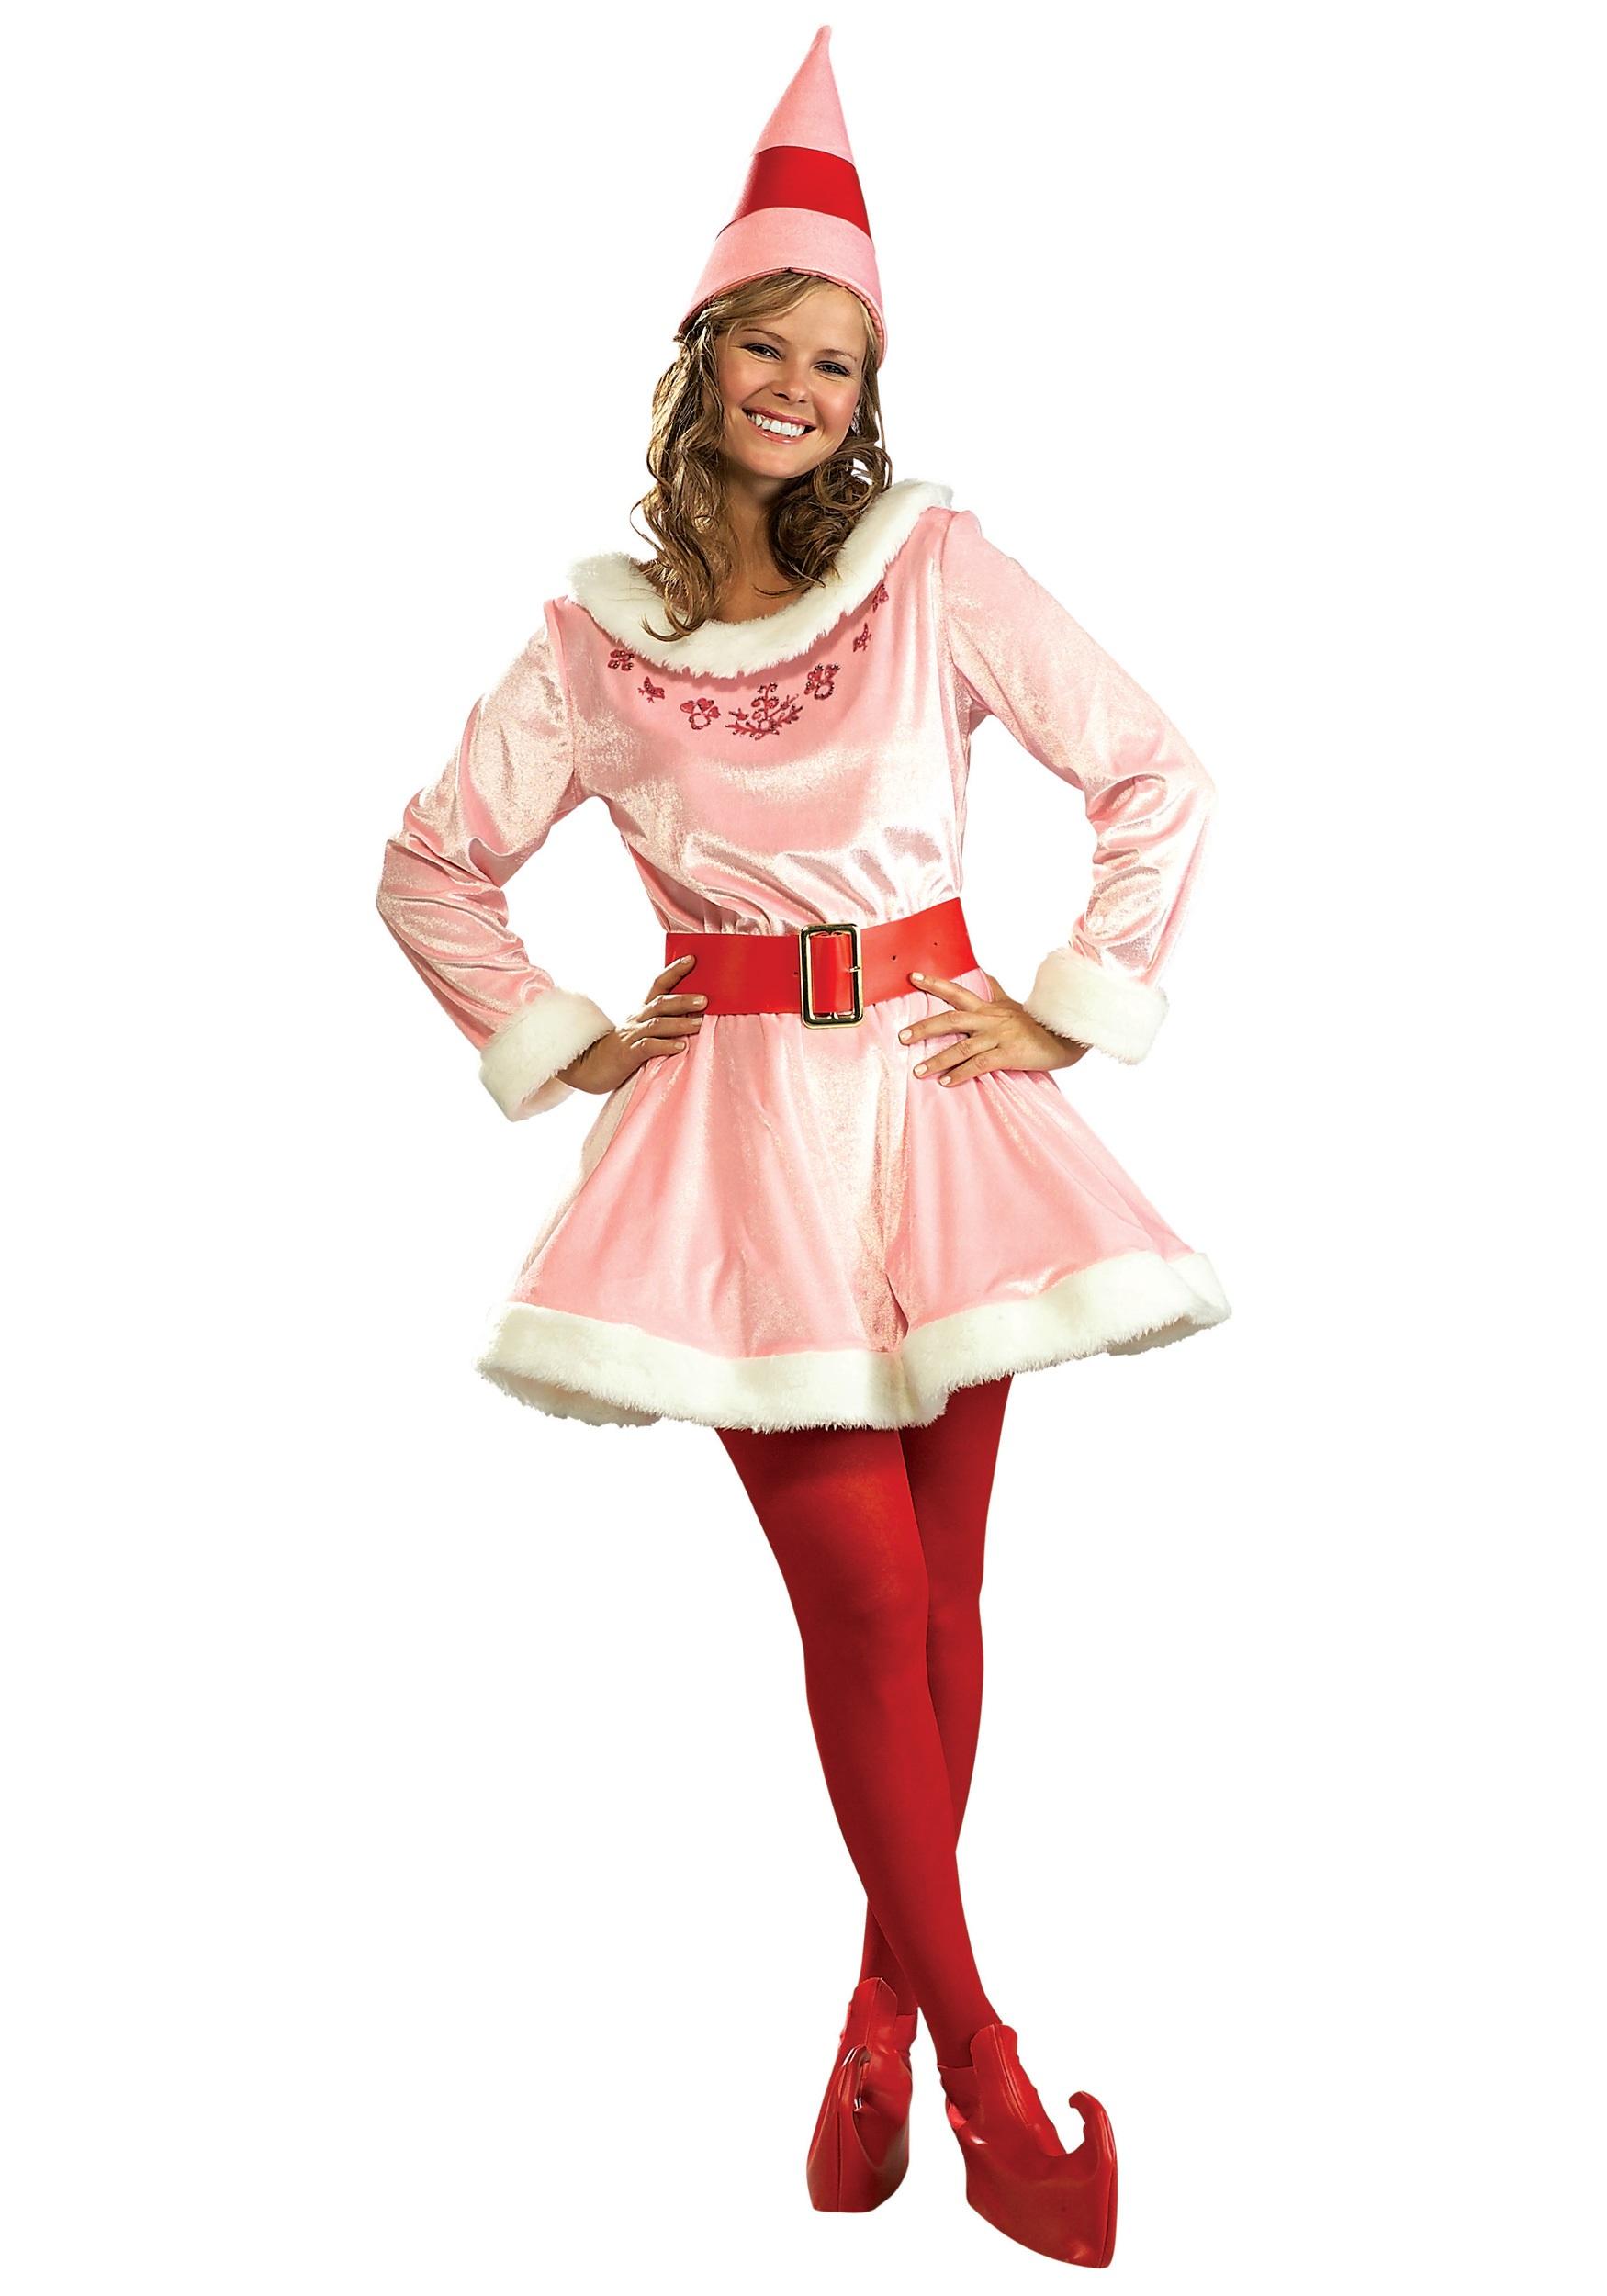 Jovi Elf Womens Costume  sc 1 st  Halloween Costume & Jovi Elf Womens Costume - The Elf Movie Costumes